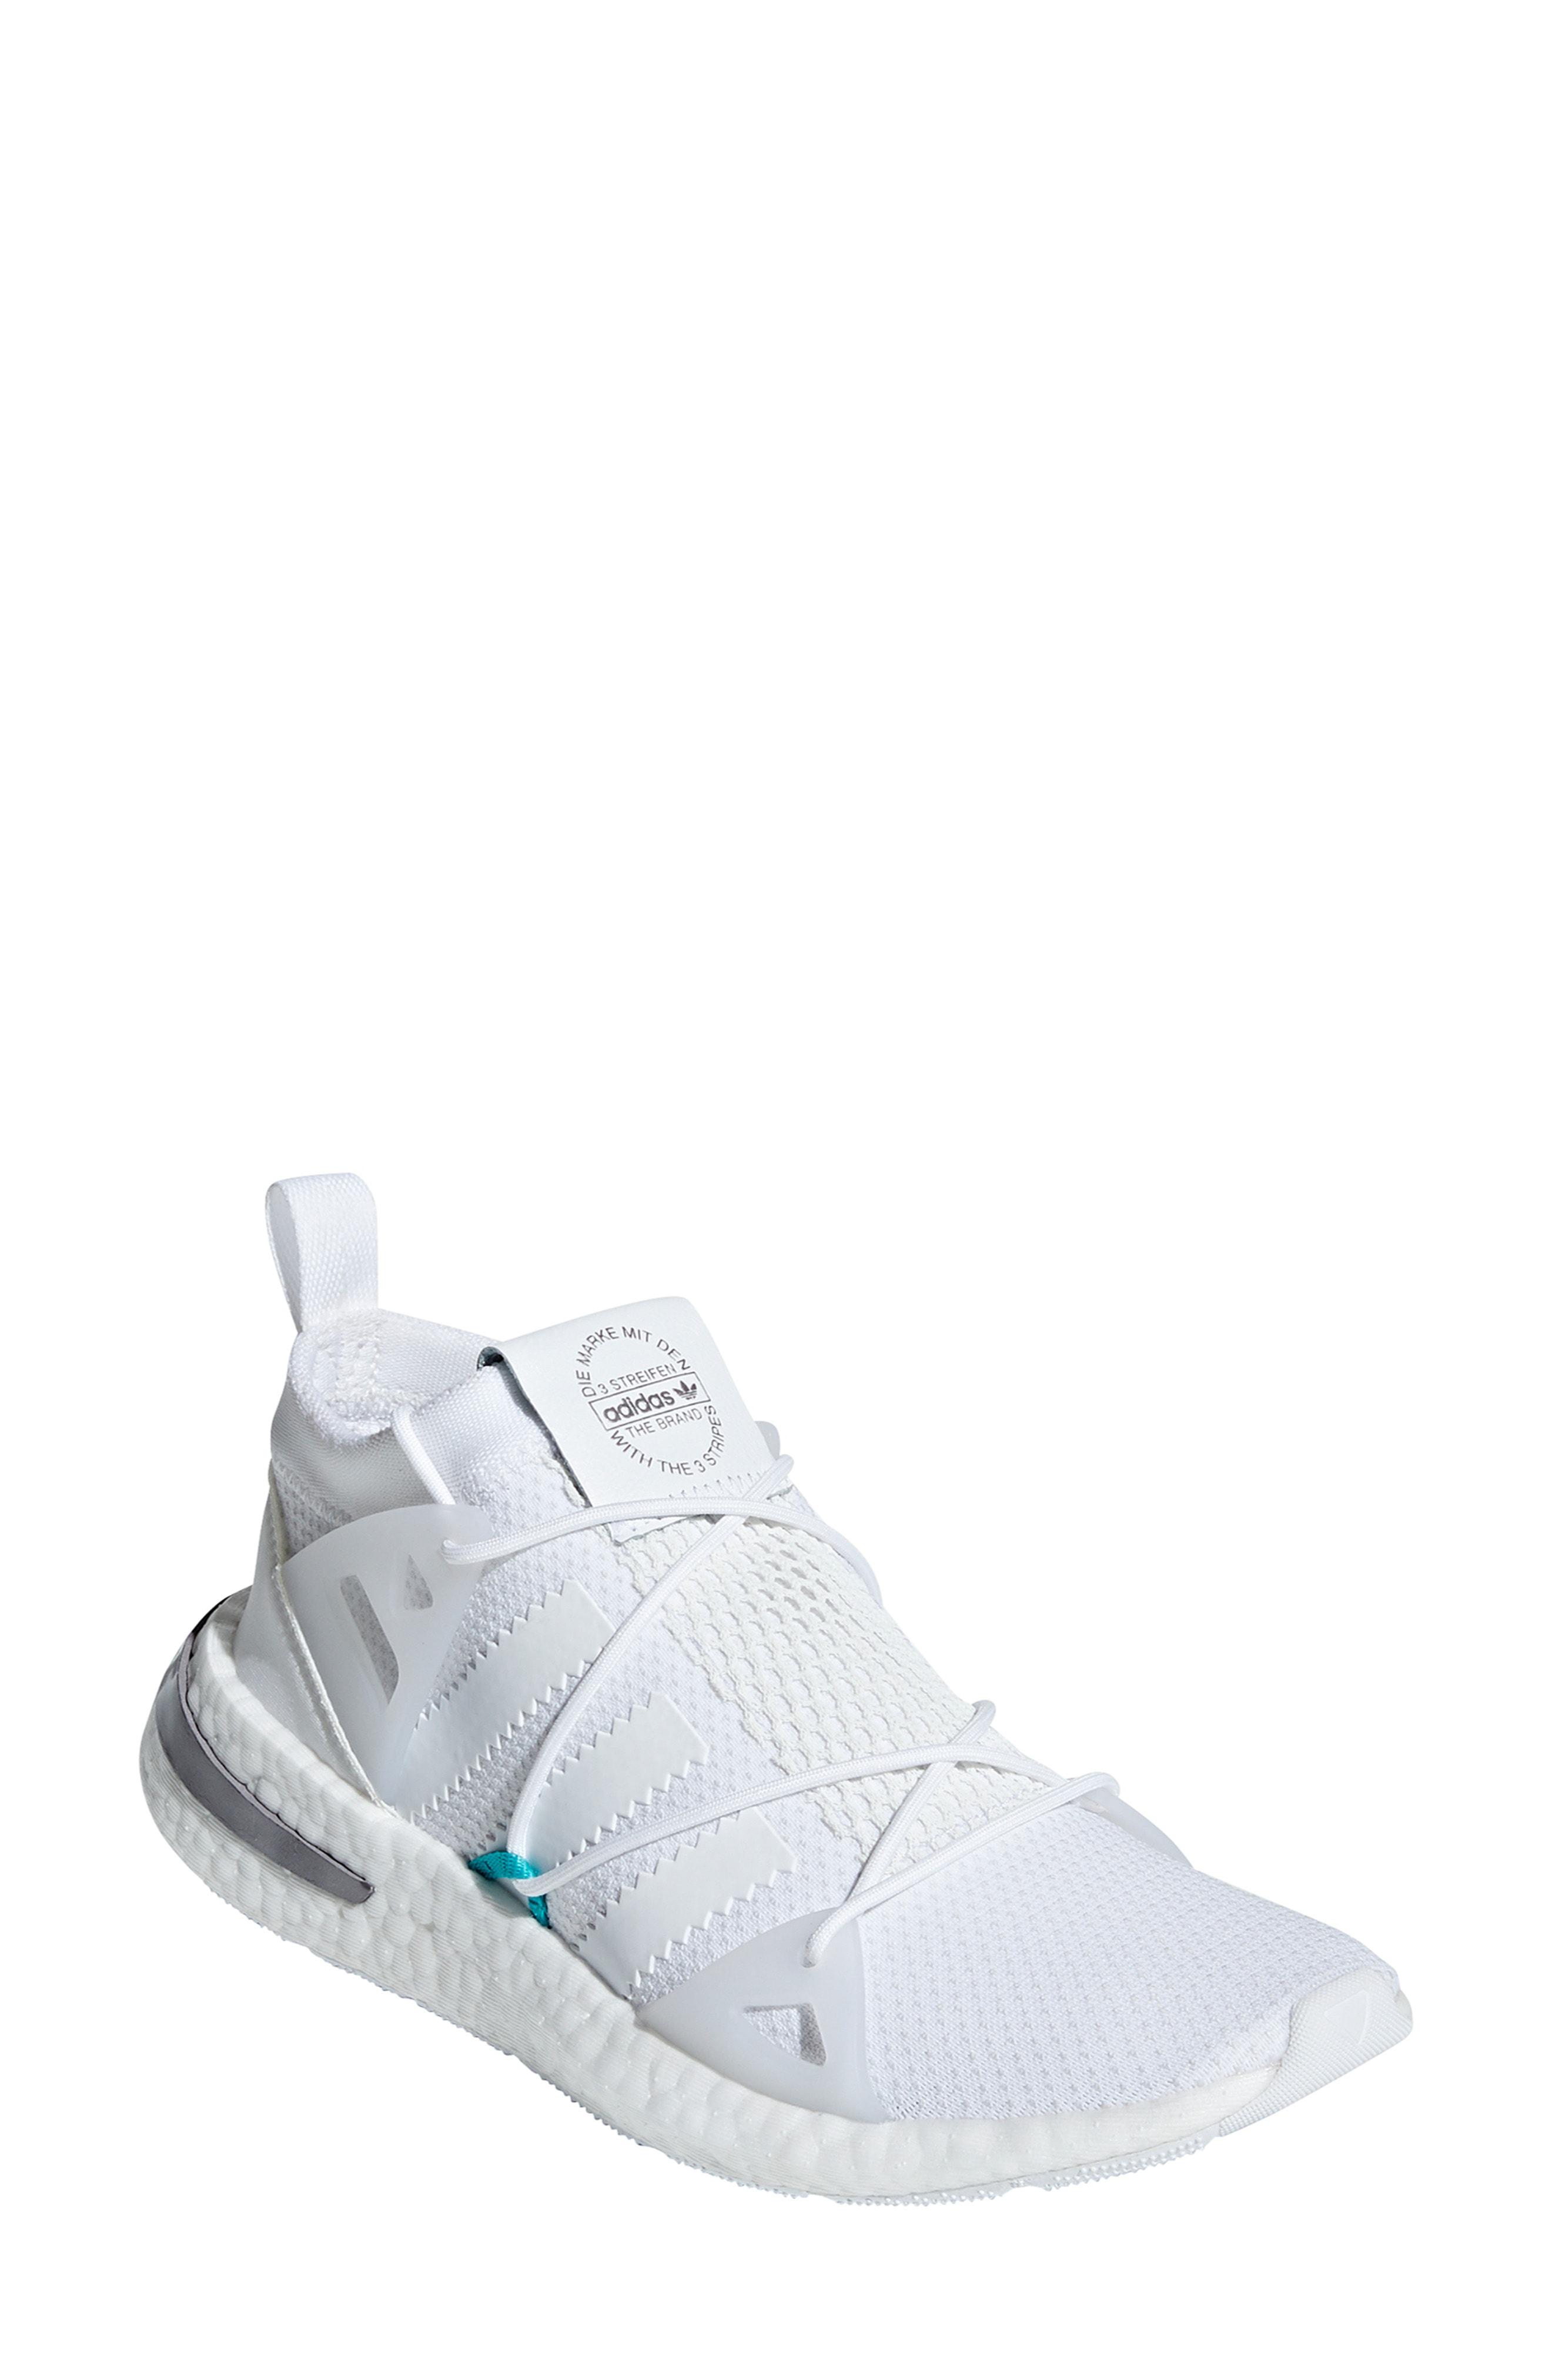 d659f985393 Adidas Originals Arkyn Sneaker In Legend Ink  True Pink. Nordstrom